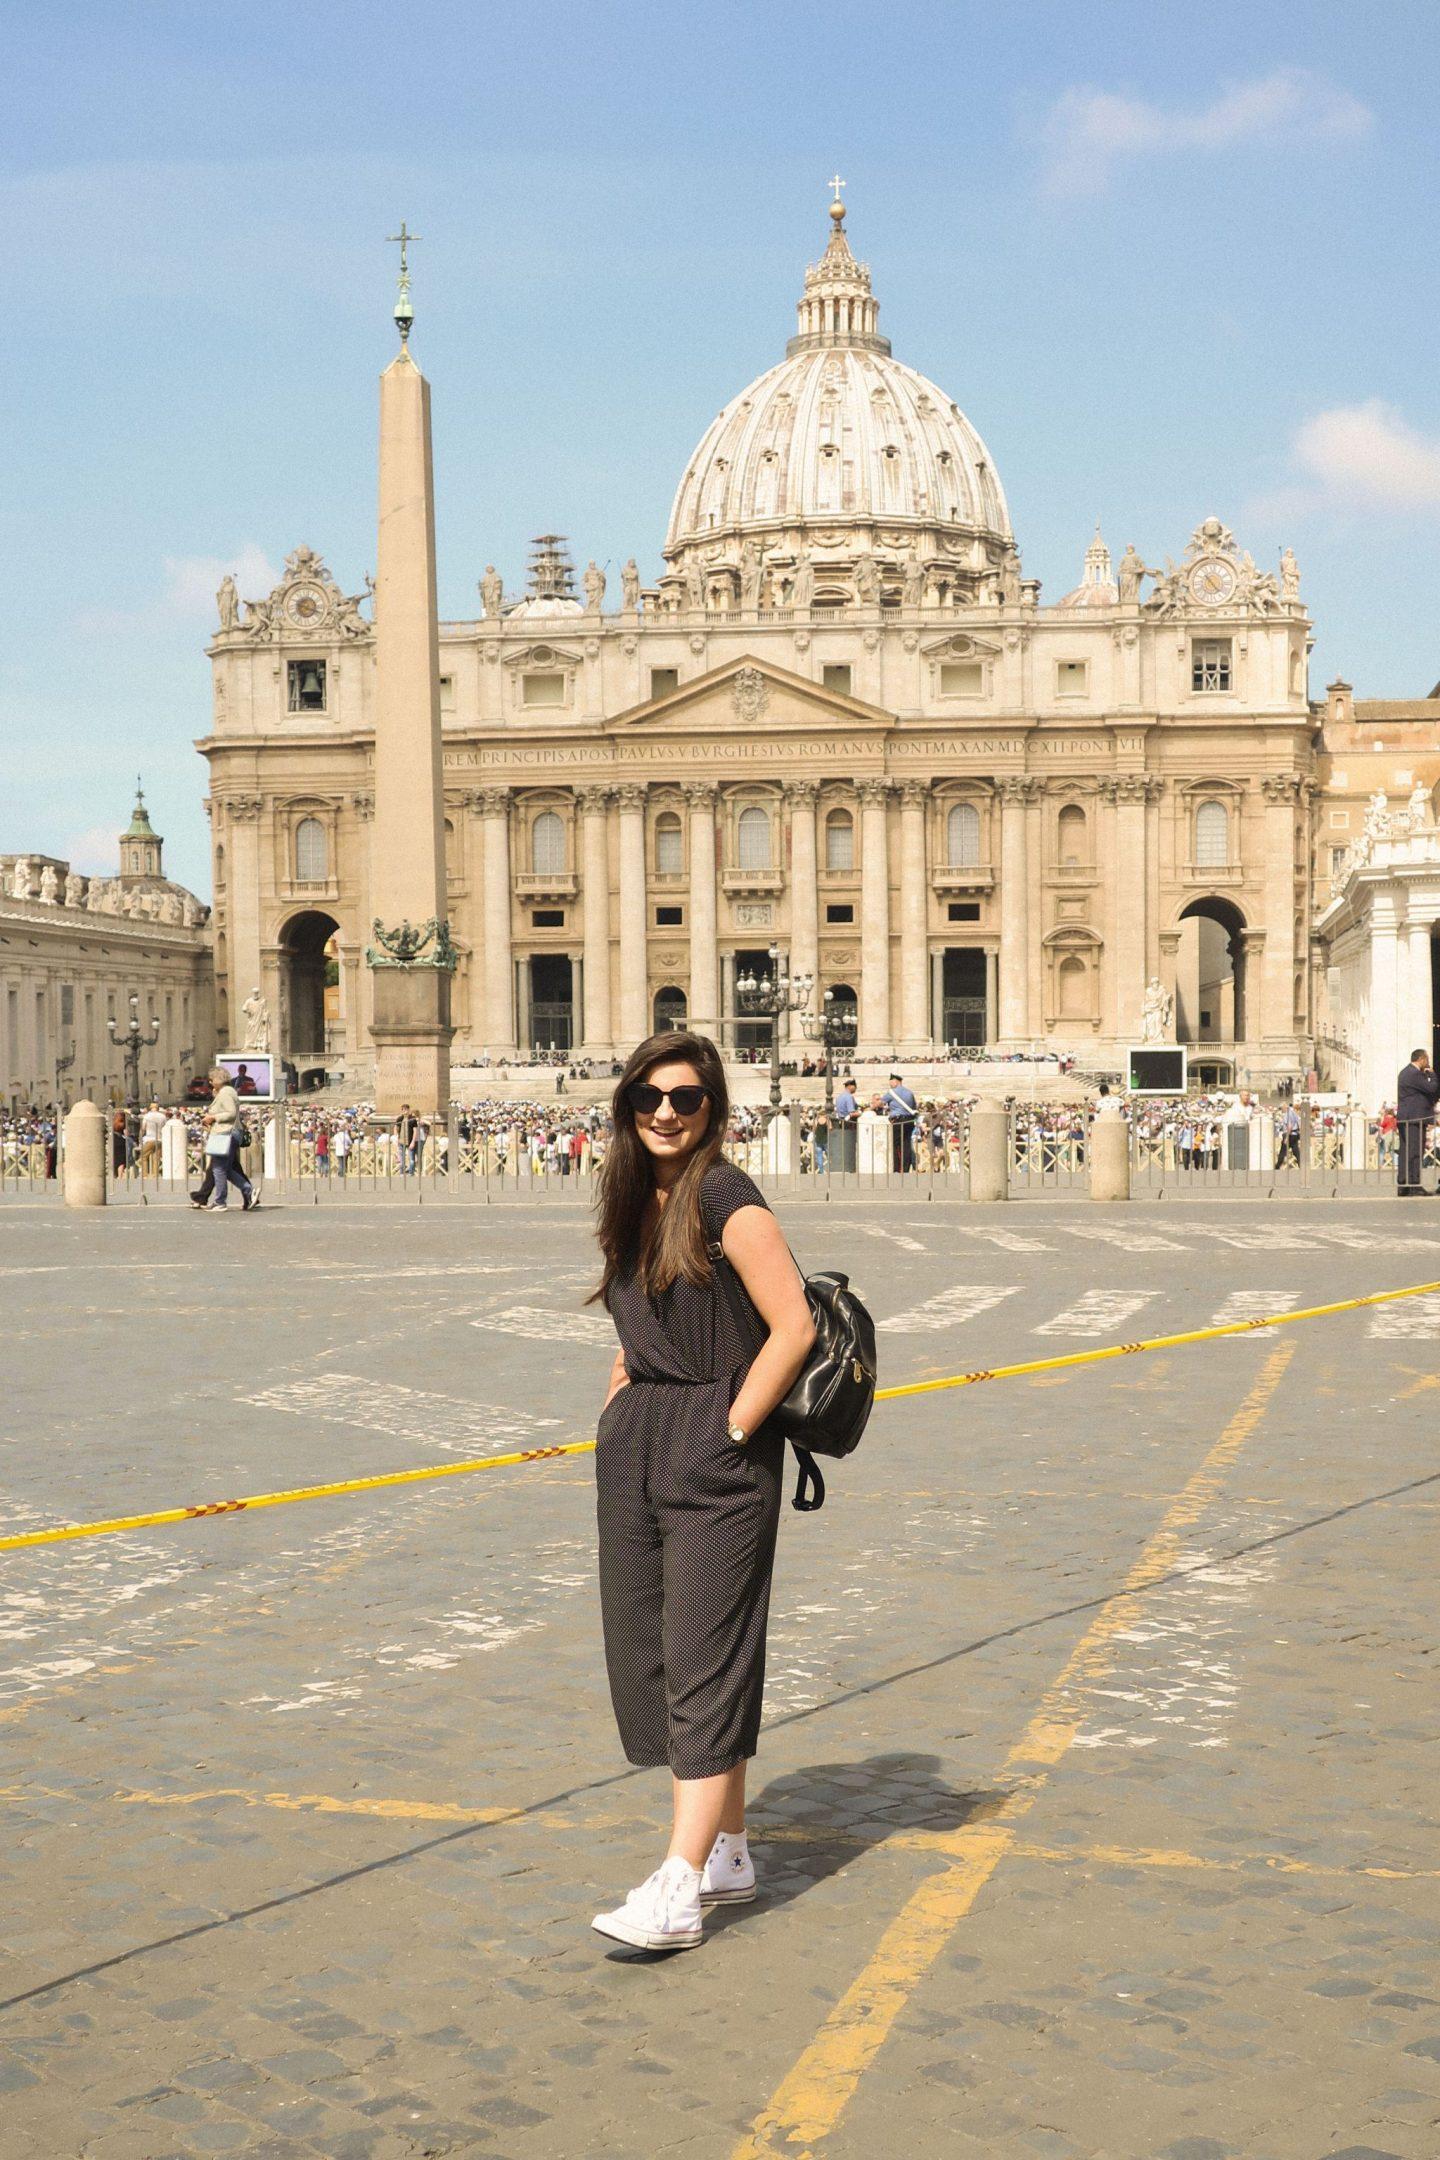 Travel Tips For Rome